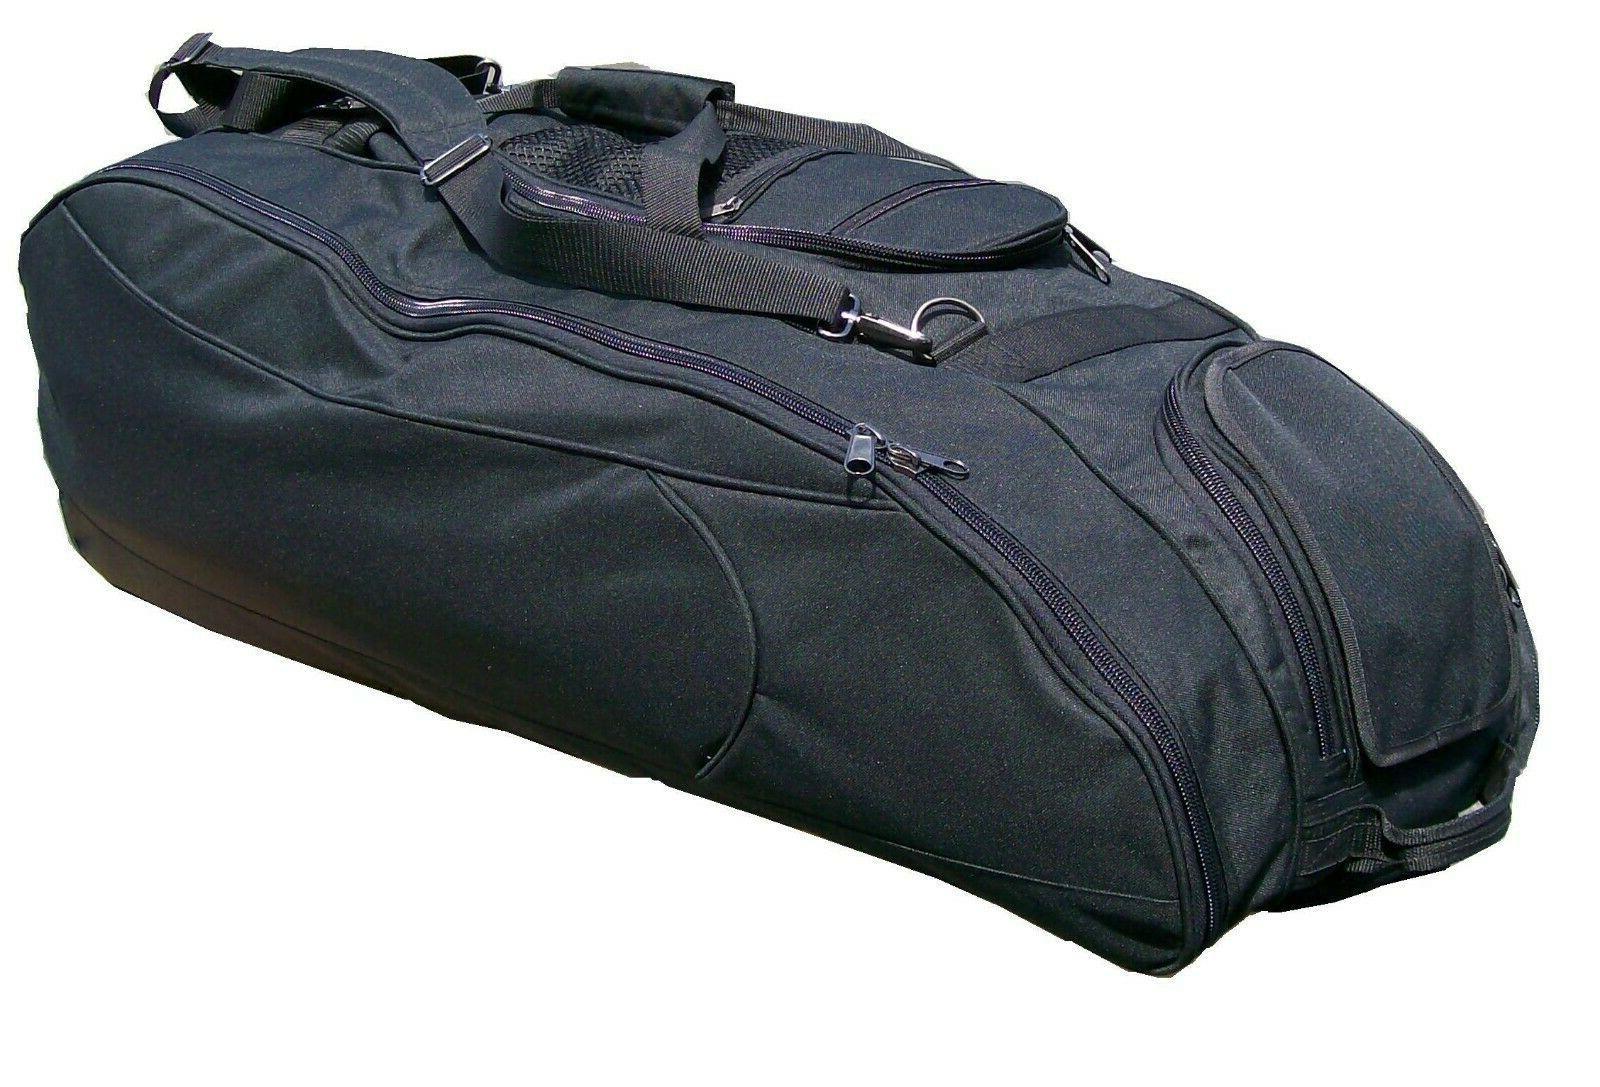 New Cobra XLIII Baseball Softball Catchers Equipment Bat Bag